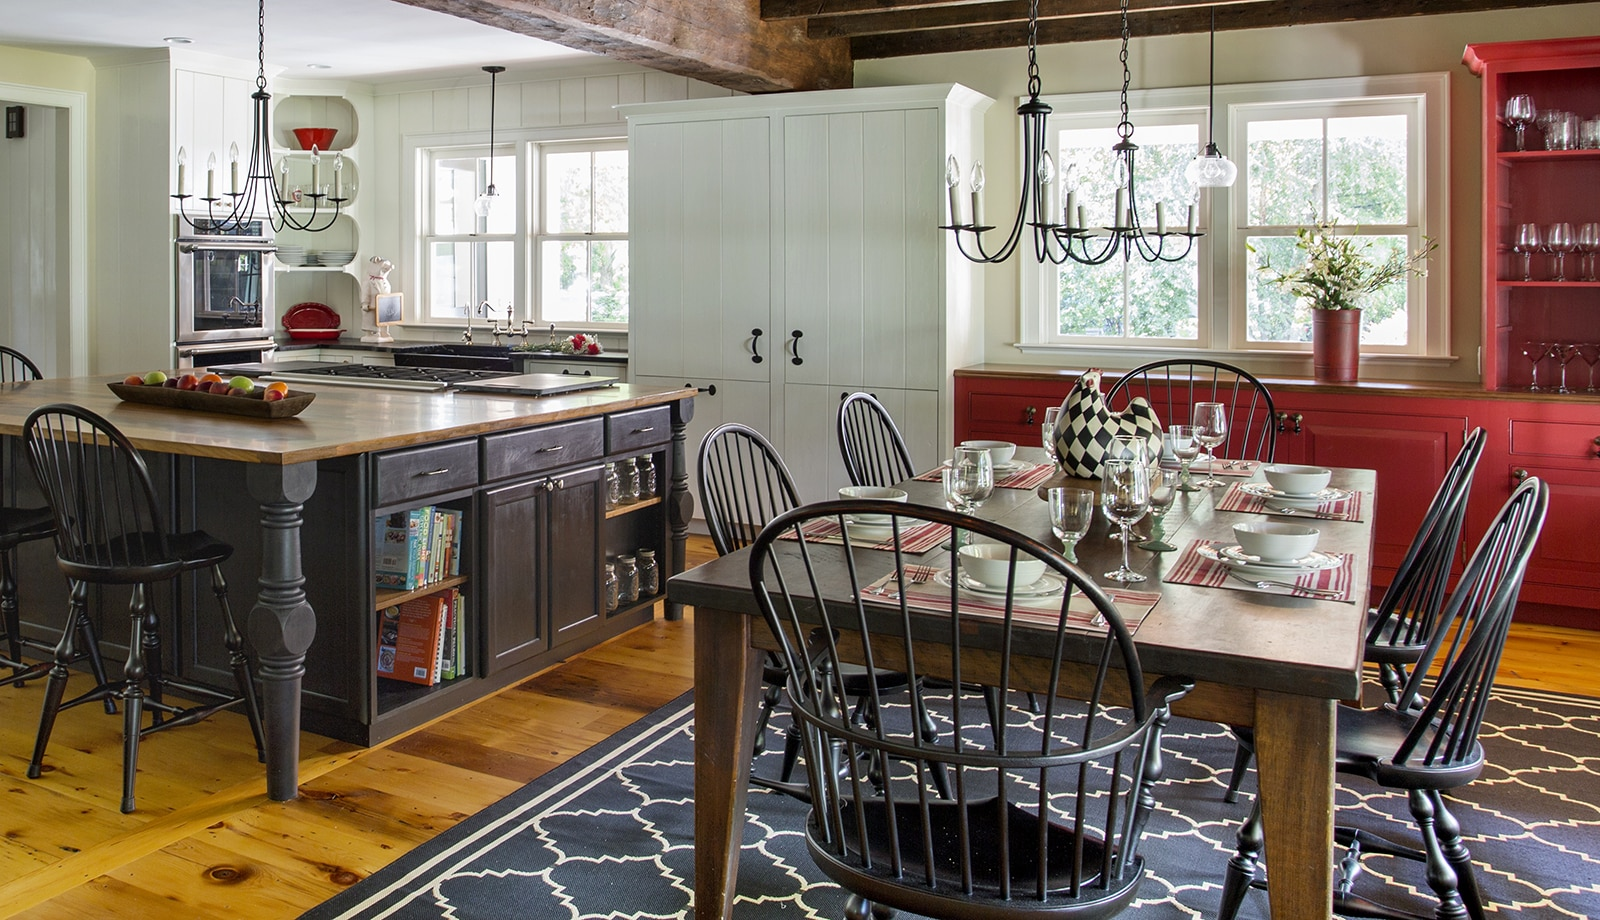 Lynnfield MA Farmhouse Kitchen featured